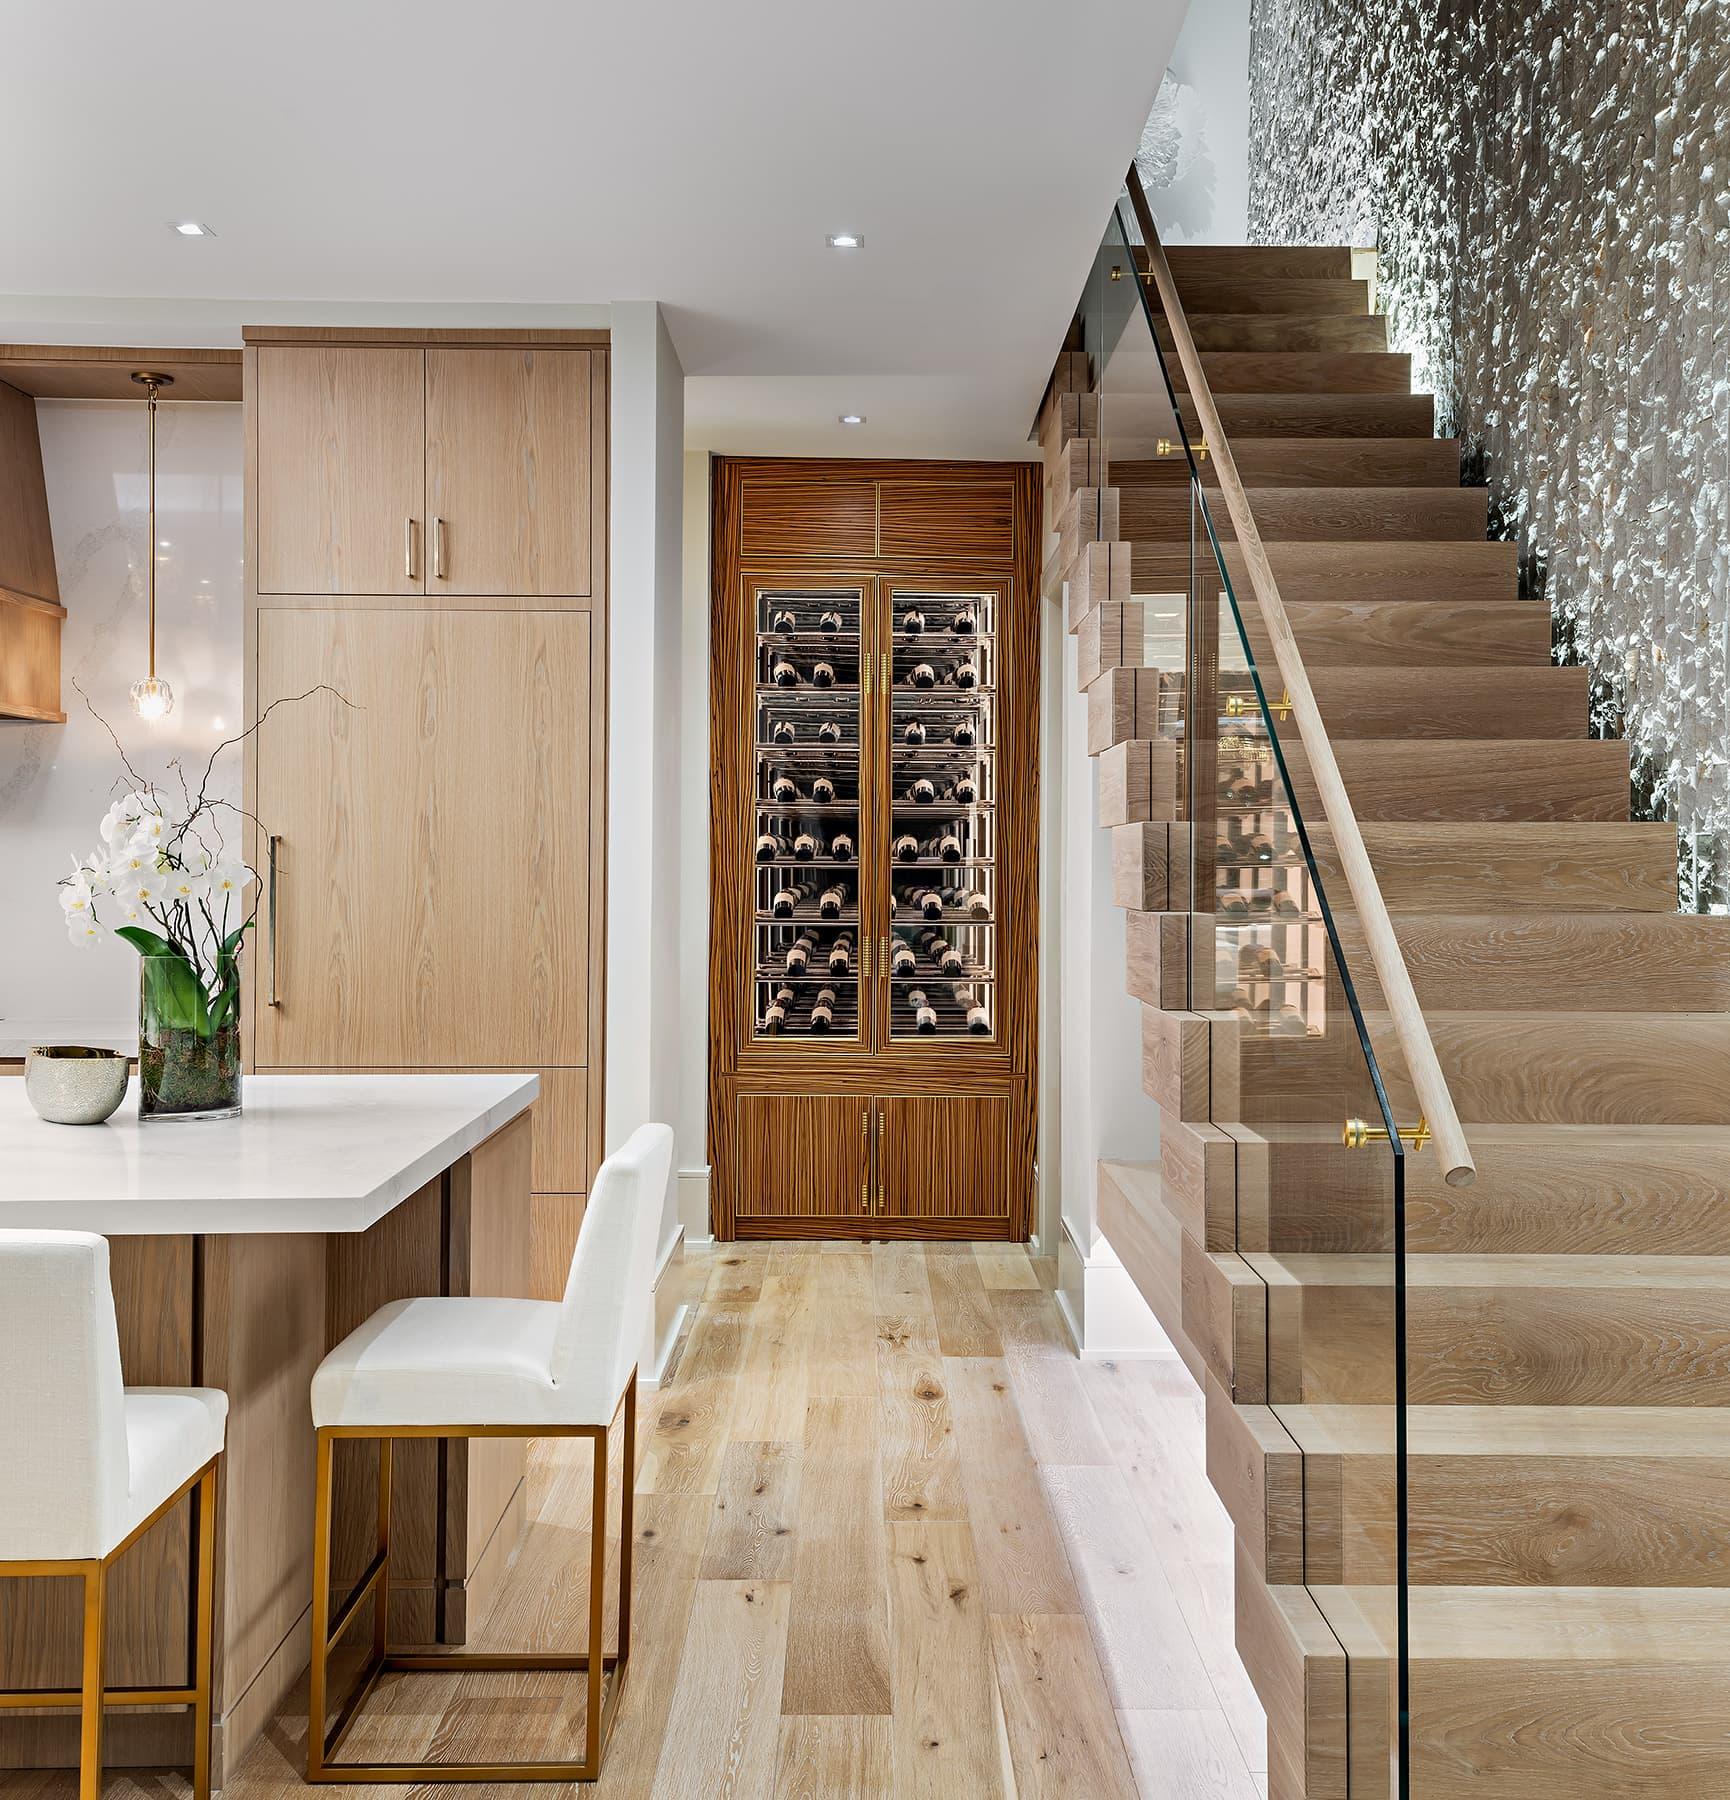 Modern Lake House Design: ONE X ONE DESIGN INC